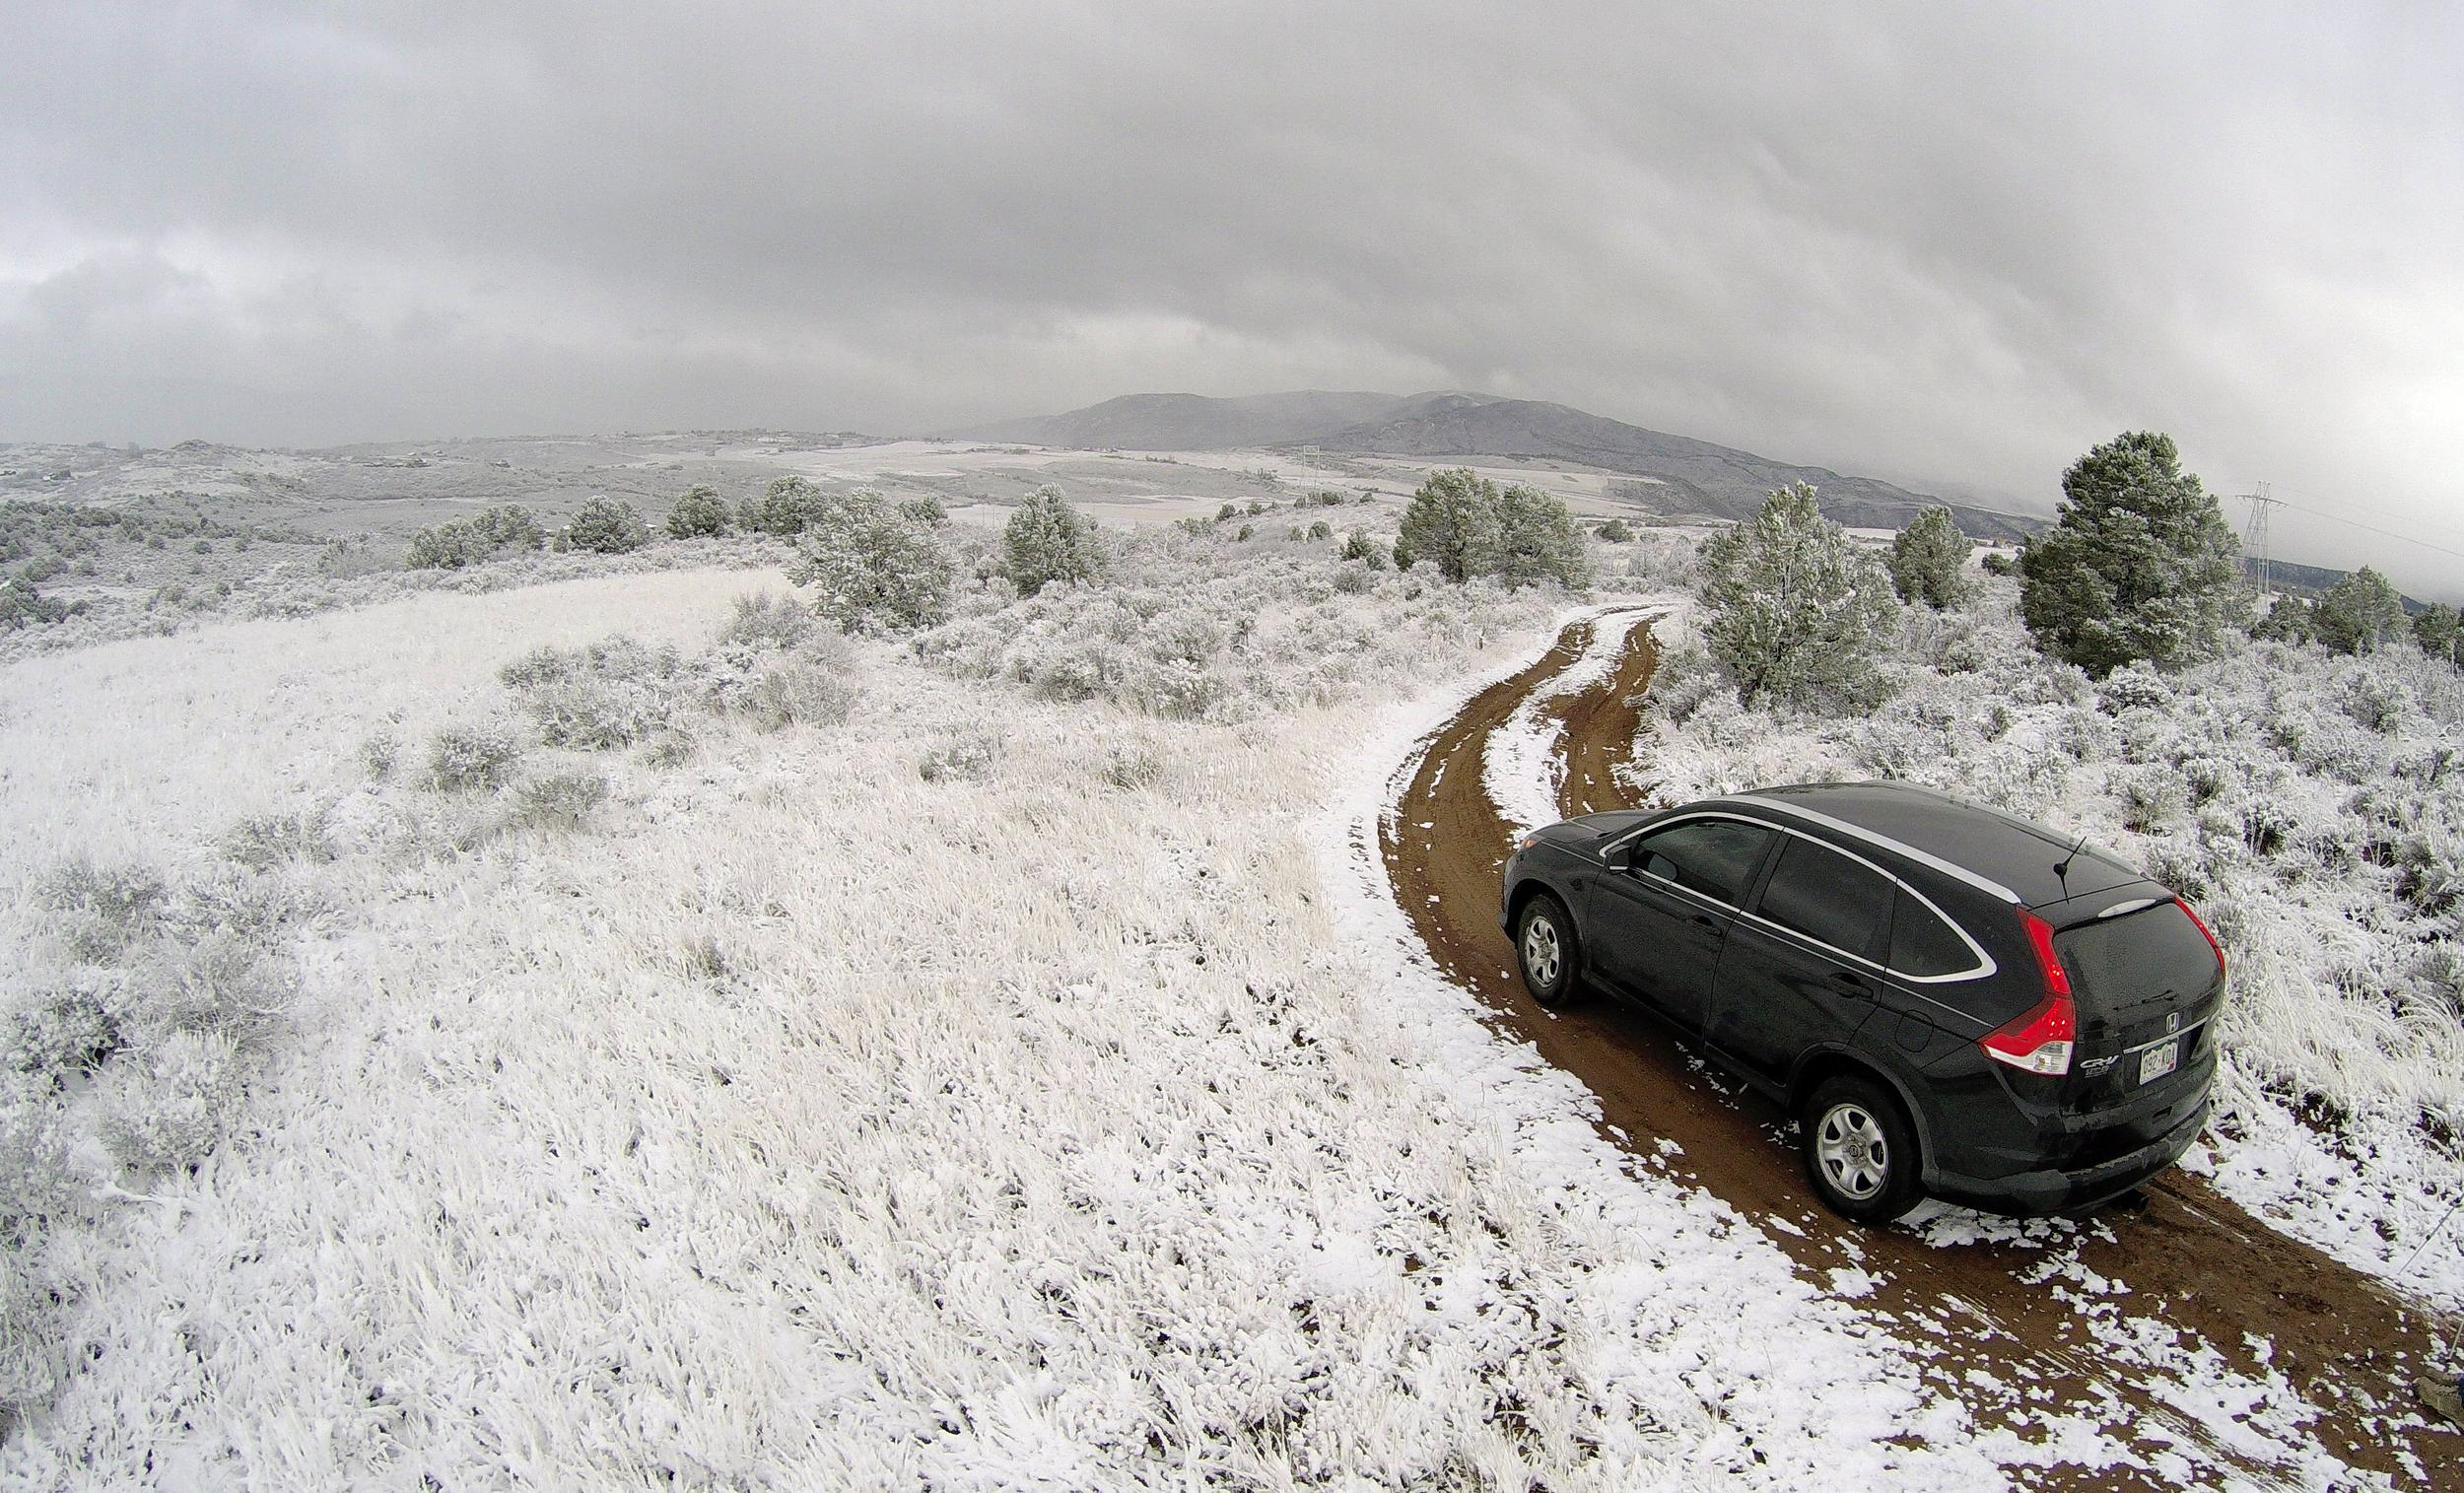 Honda CRV snow.jpg